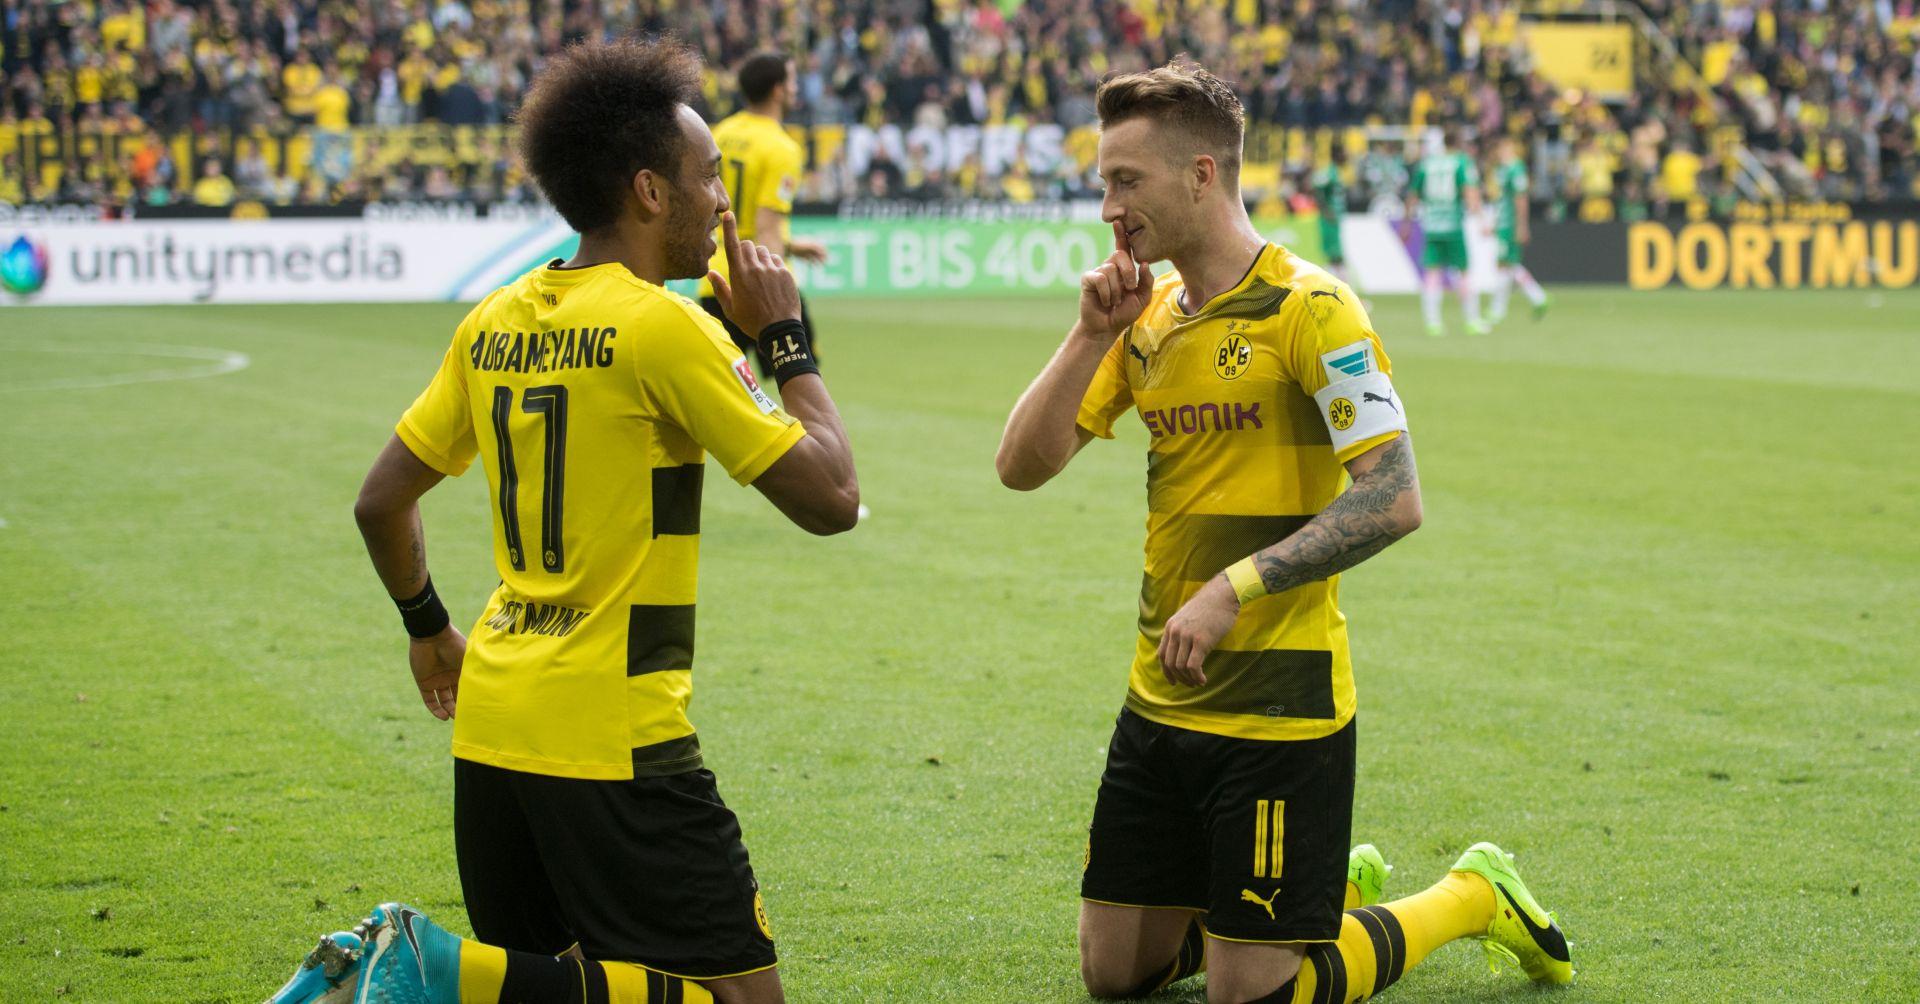 NJEMAČKA HSV se spasio, Dortmund u Ligi prvaka